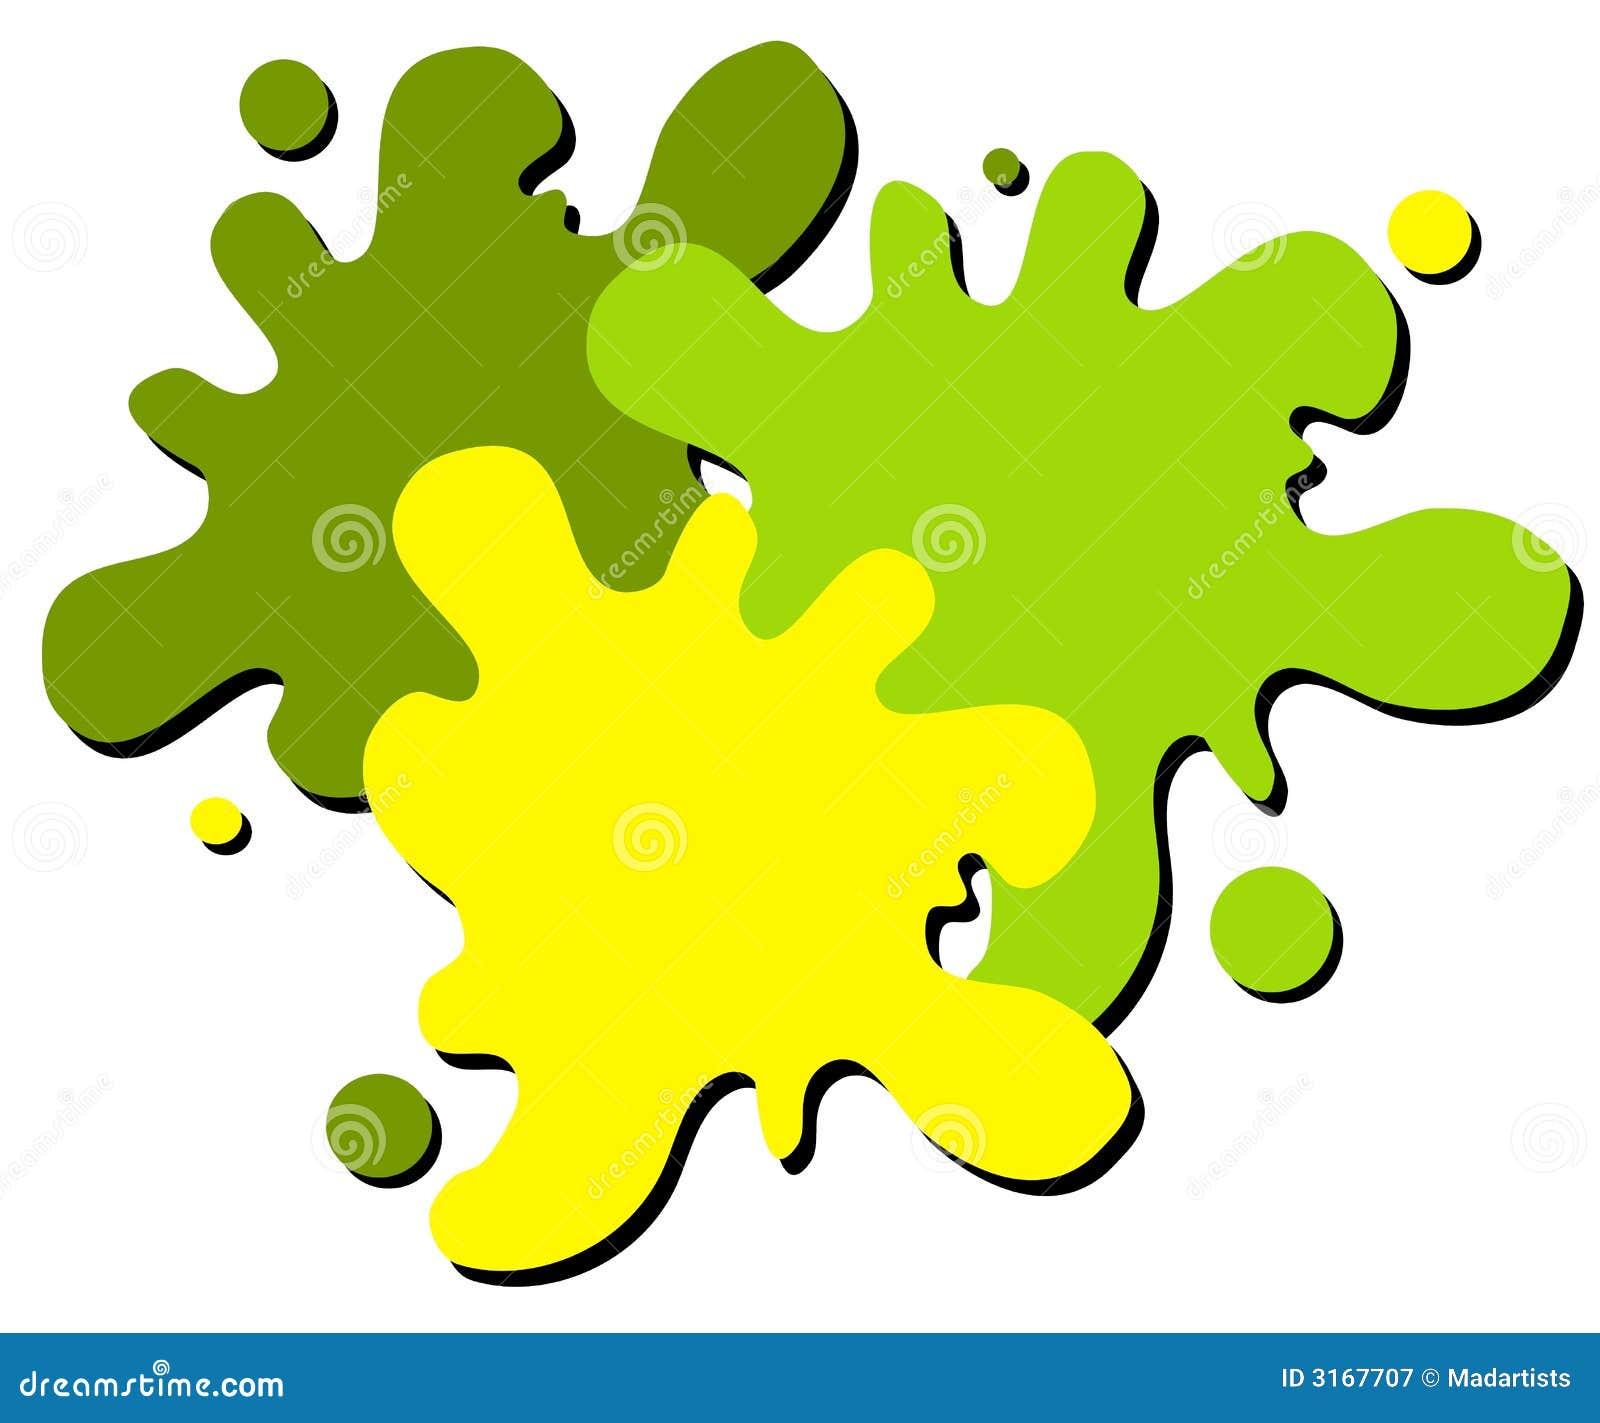 Wet Paint Splatter Web Logo 2 Royalty Free Stock